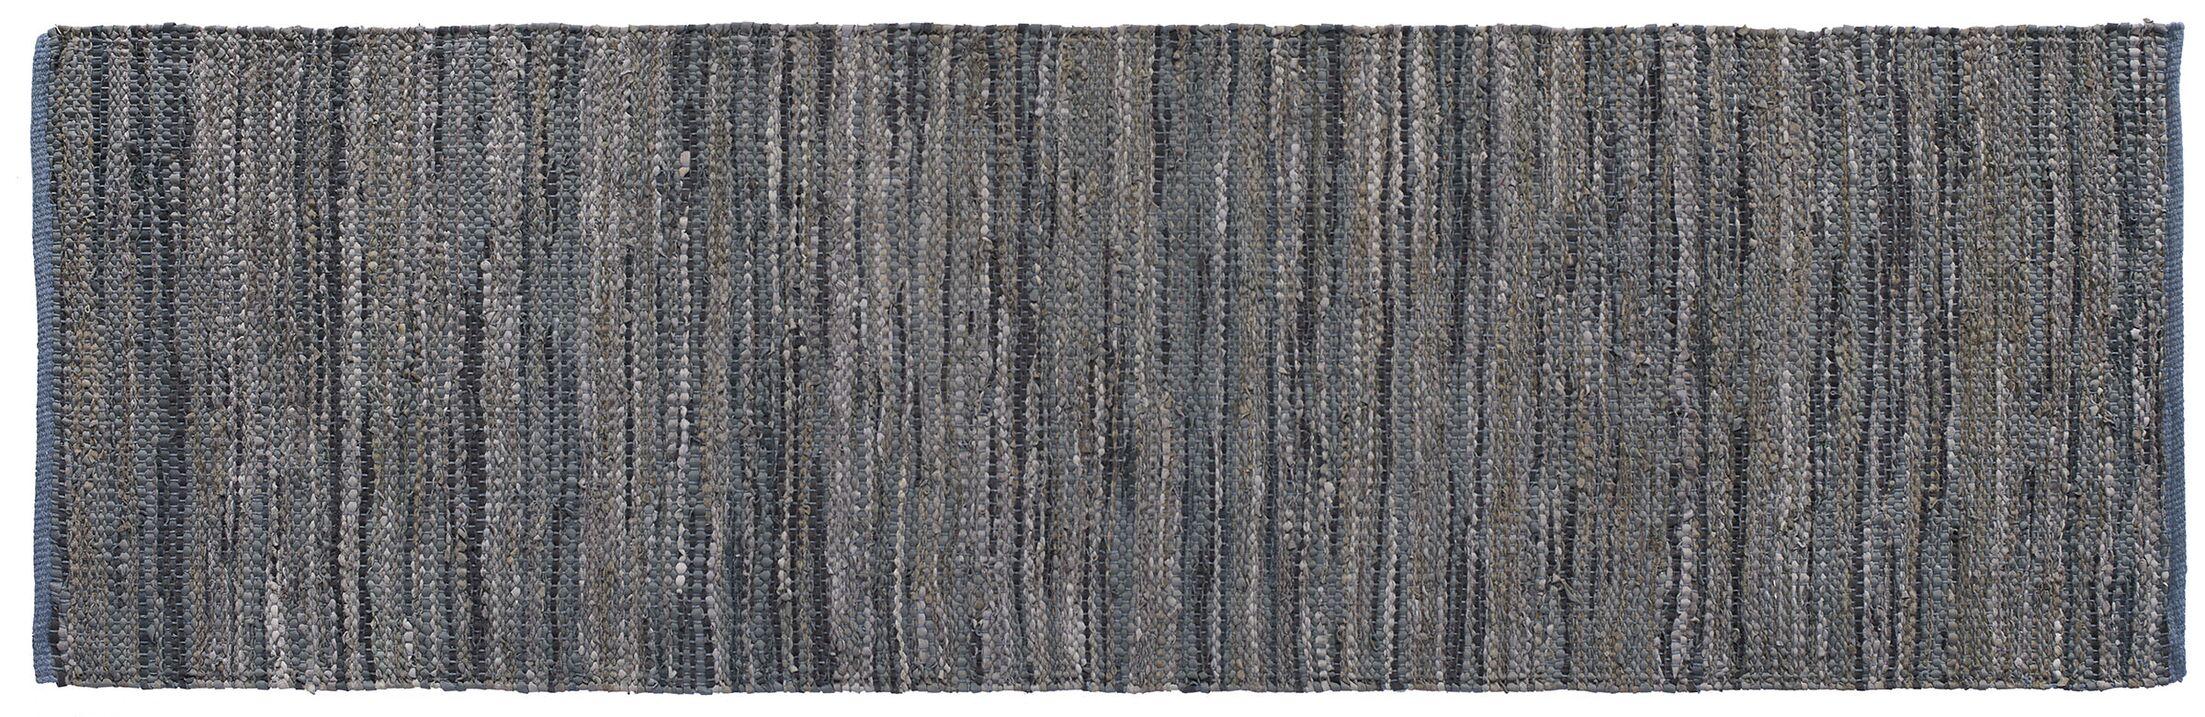 Monterey Hand-Woven Dove Gray Area Rug Rug Size: Runner 2'6